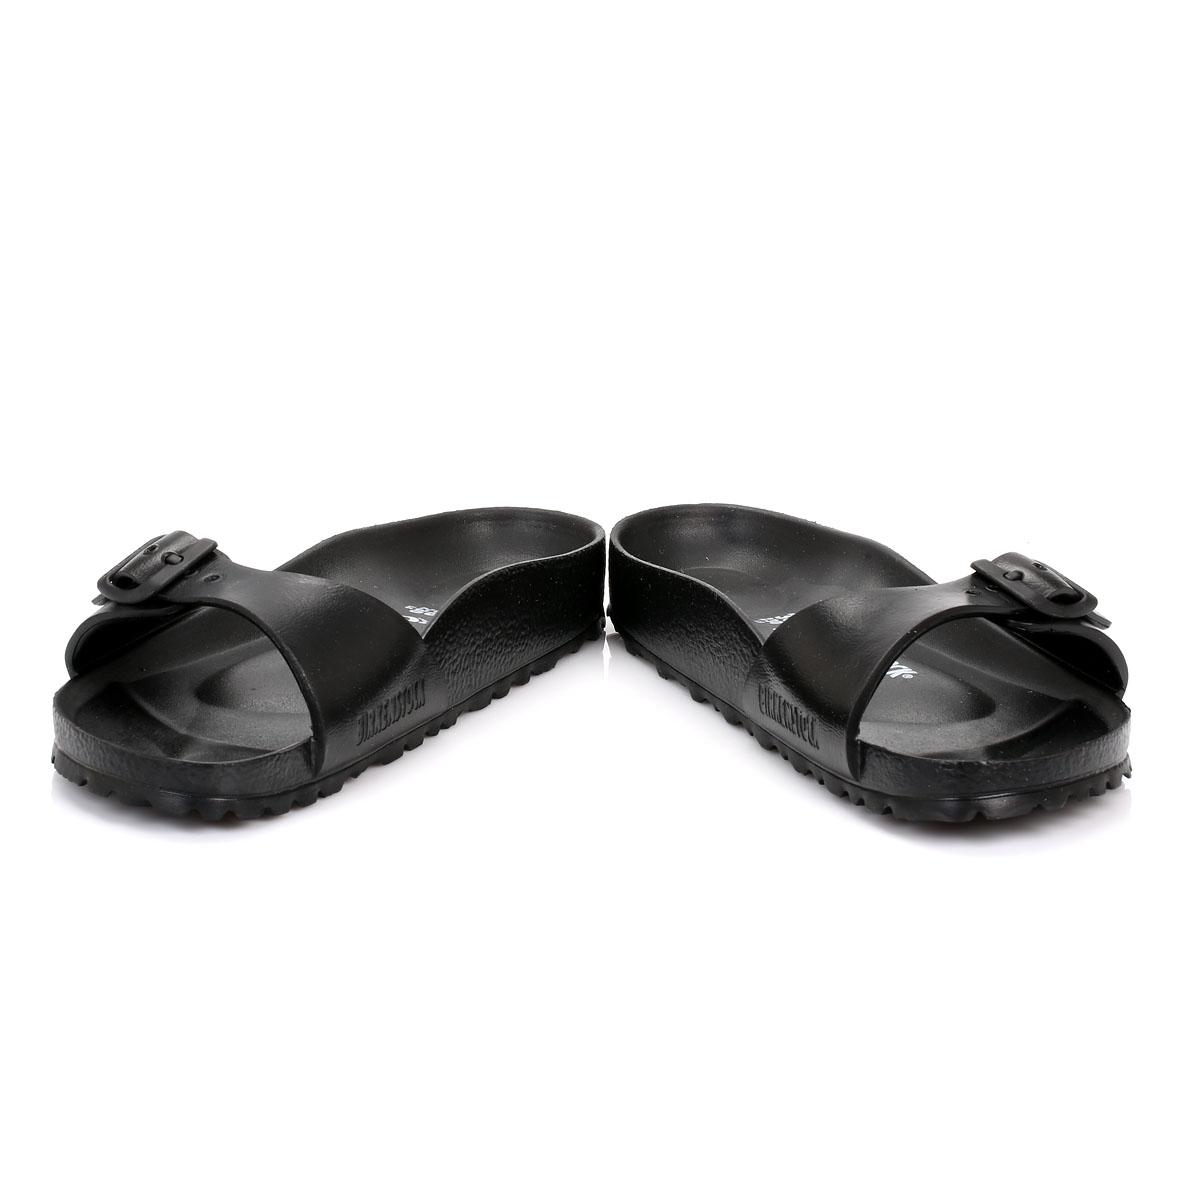 e01e86ebb Birkenstock Womens Black Madrid EVA Sandals, Lightweight, Adjustable ...